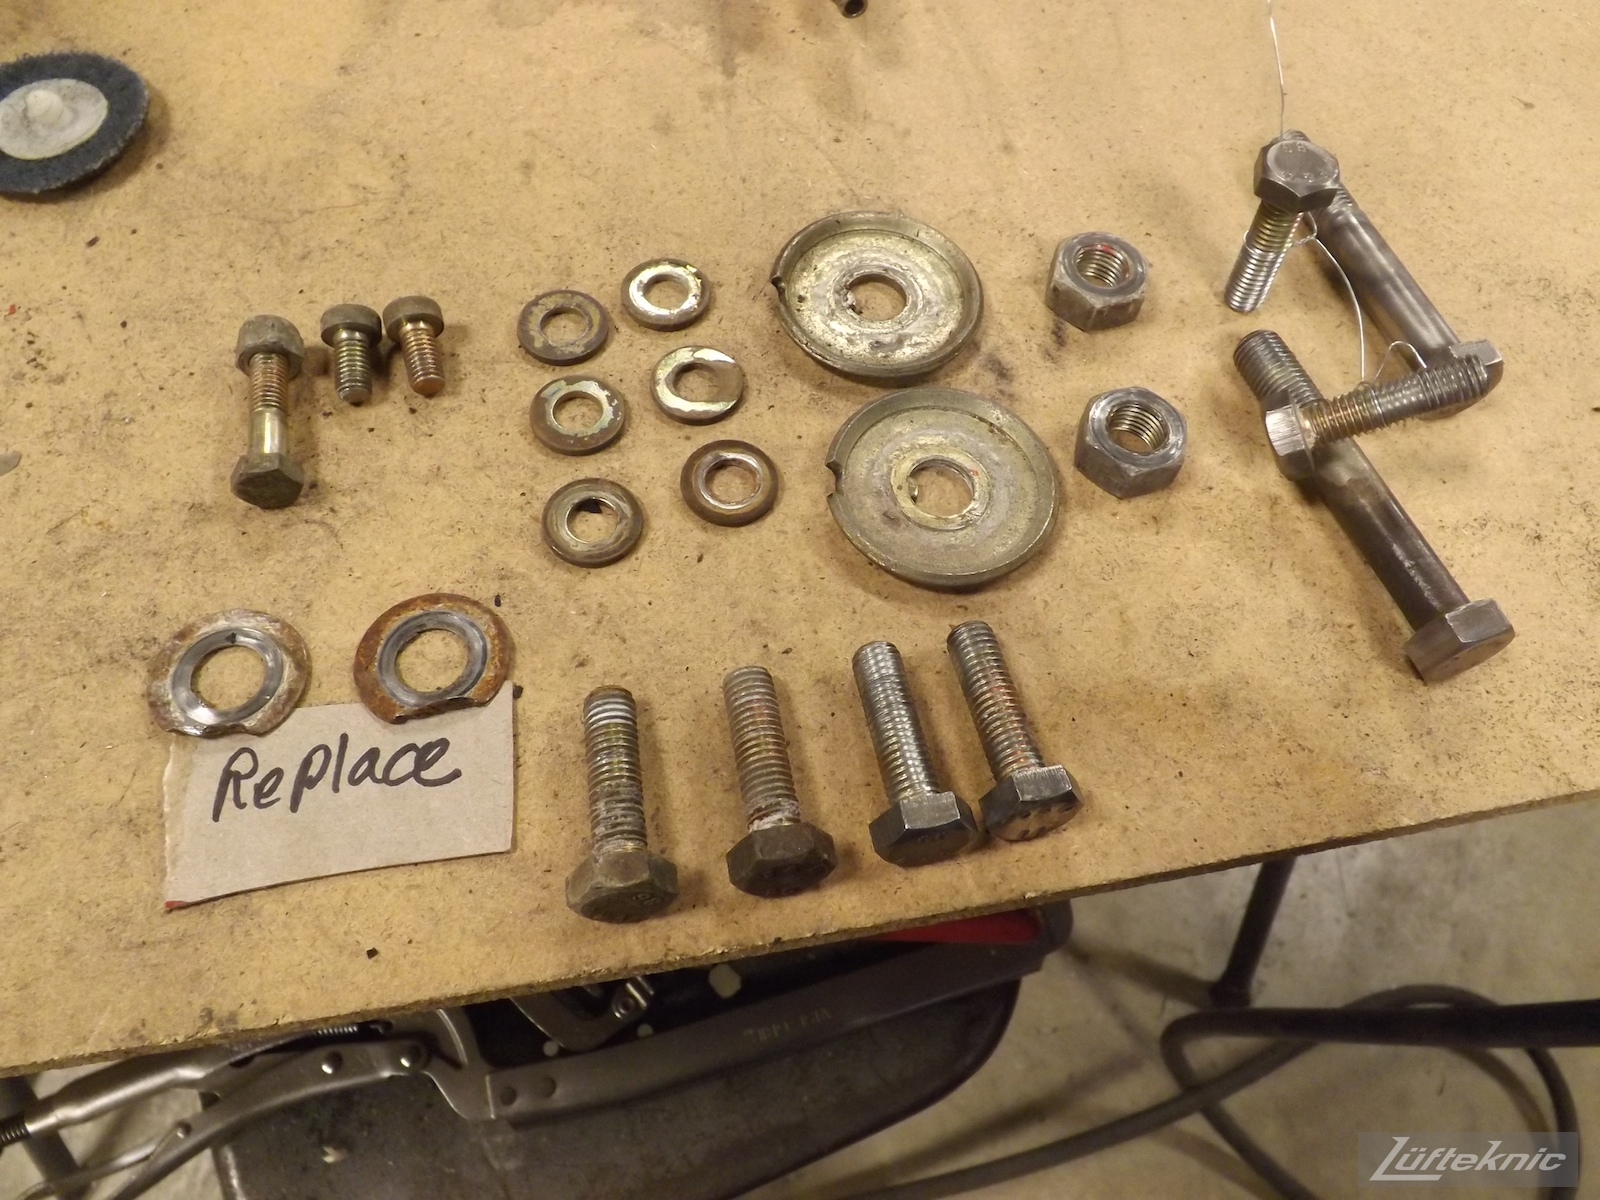 Hardware being prepped for replating for an Irish Green Porsche 912 undergoing restoration at Lufteknic.